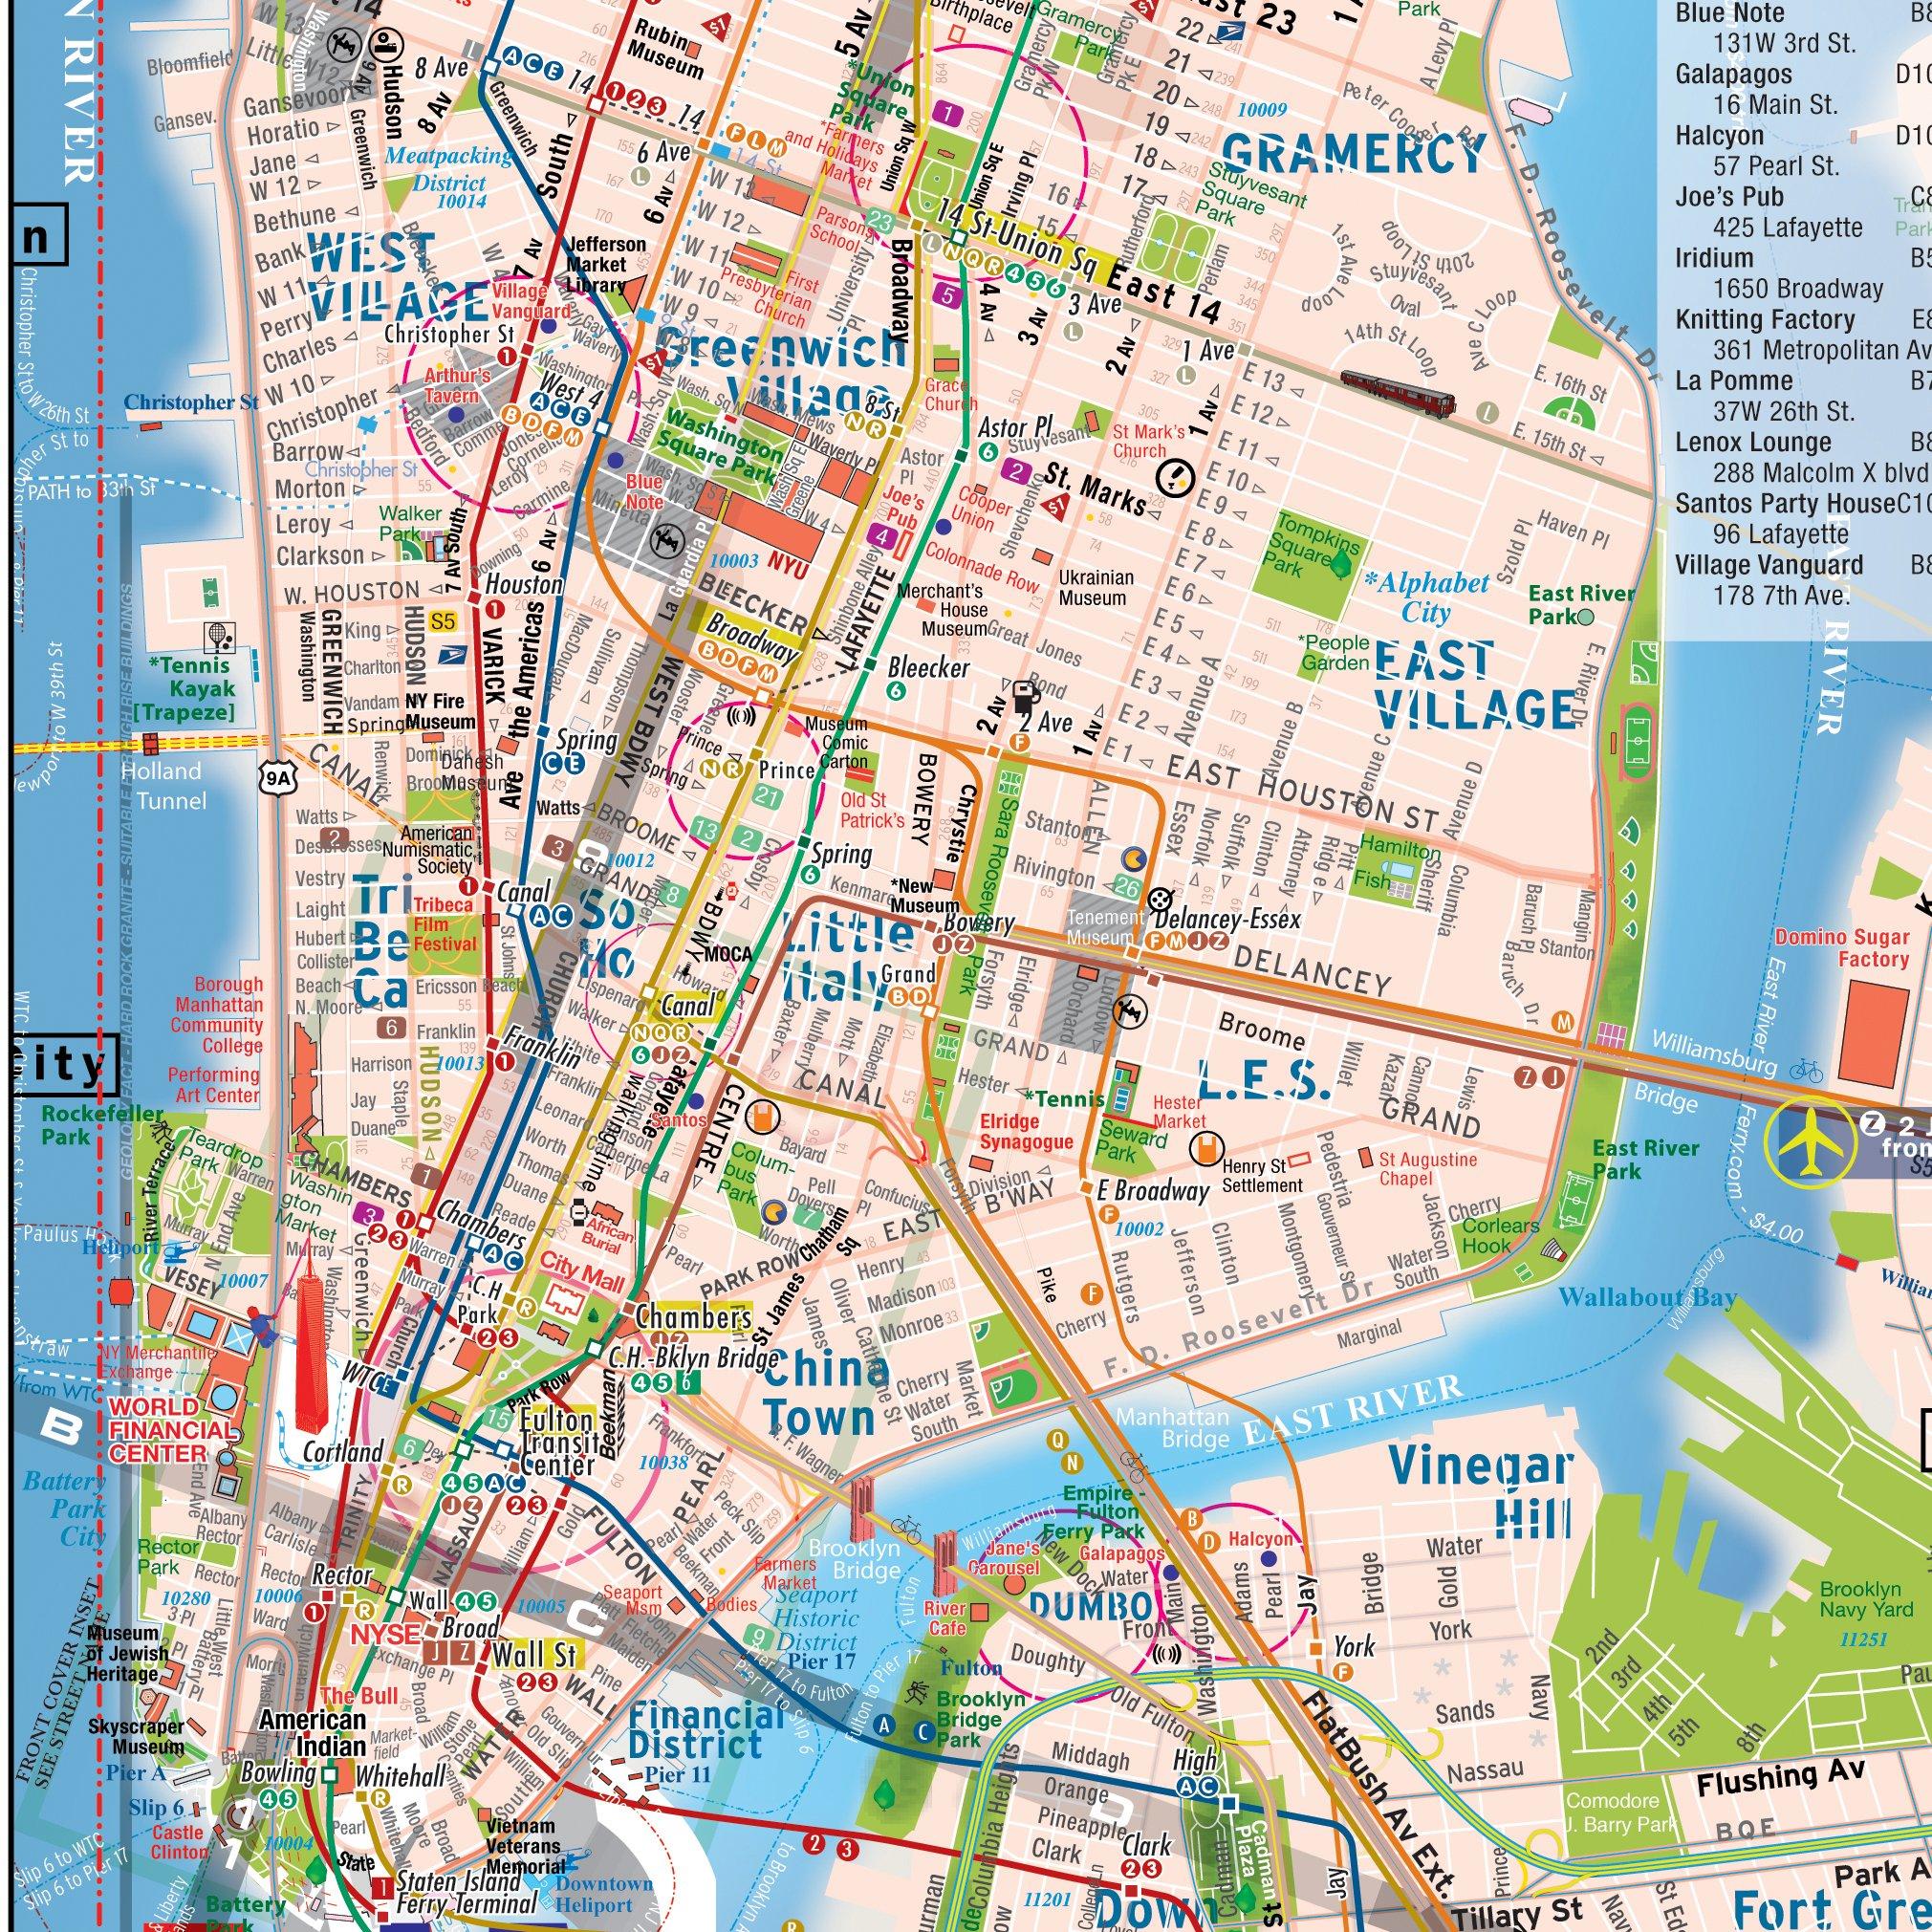 New York Subway Maps With Streets.Terramaps Nyc Manhattan Street And Subway Map Waterproof Pocket Alberto Michieli Alberto Michieli Alberto Michieli 9780983879220 Amazon Com Books